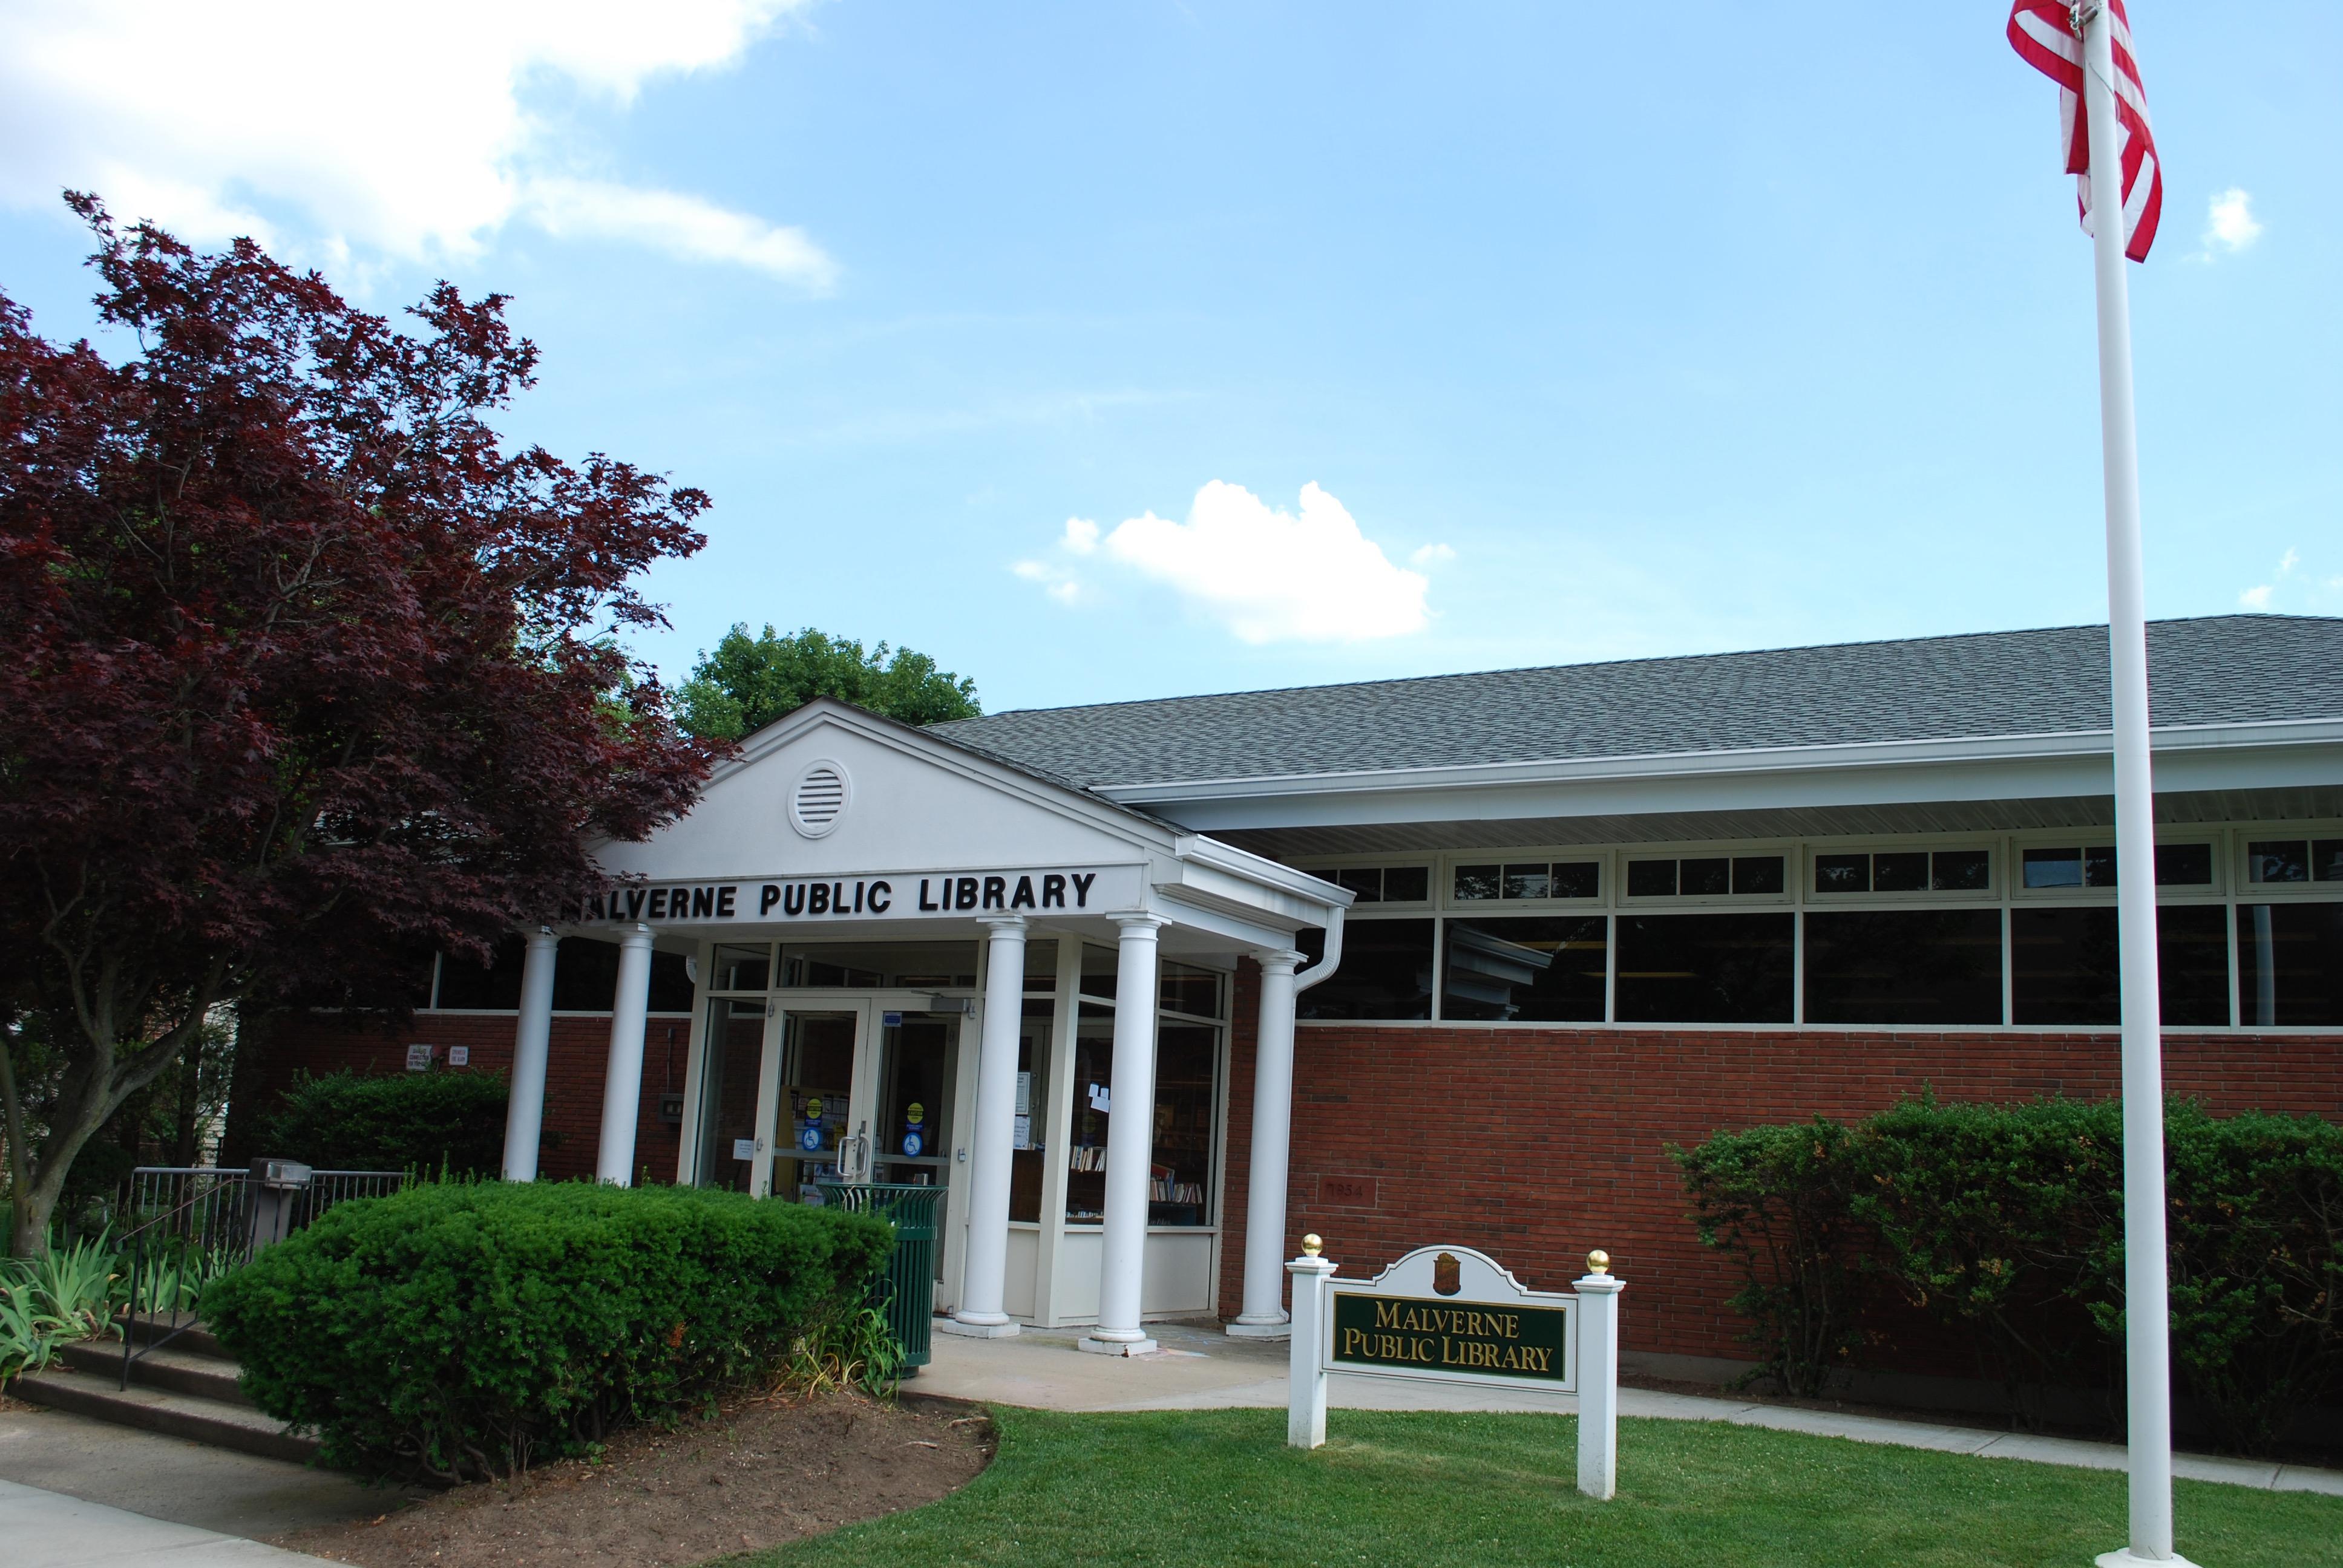 Malverne Public Library